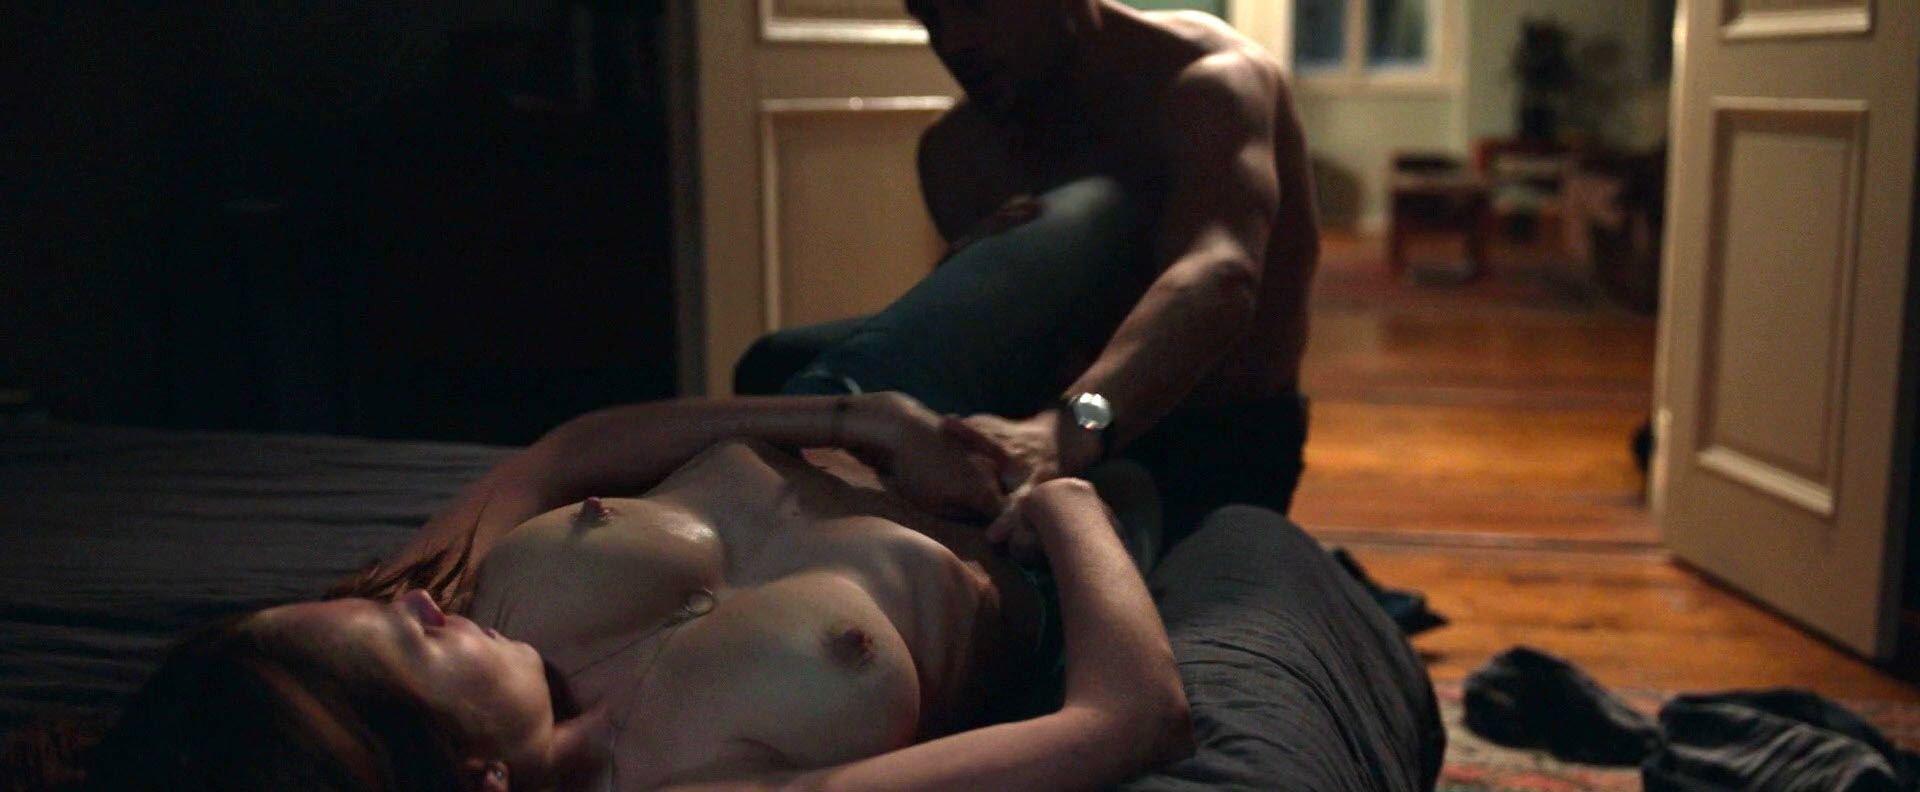 hot sexy naked women boobs gif